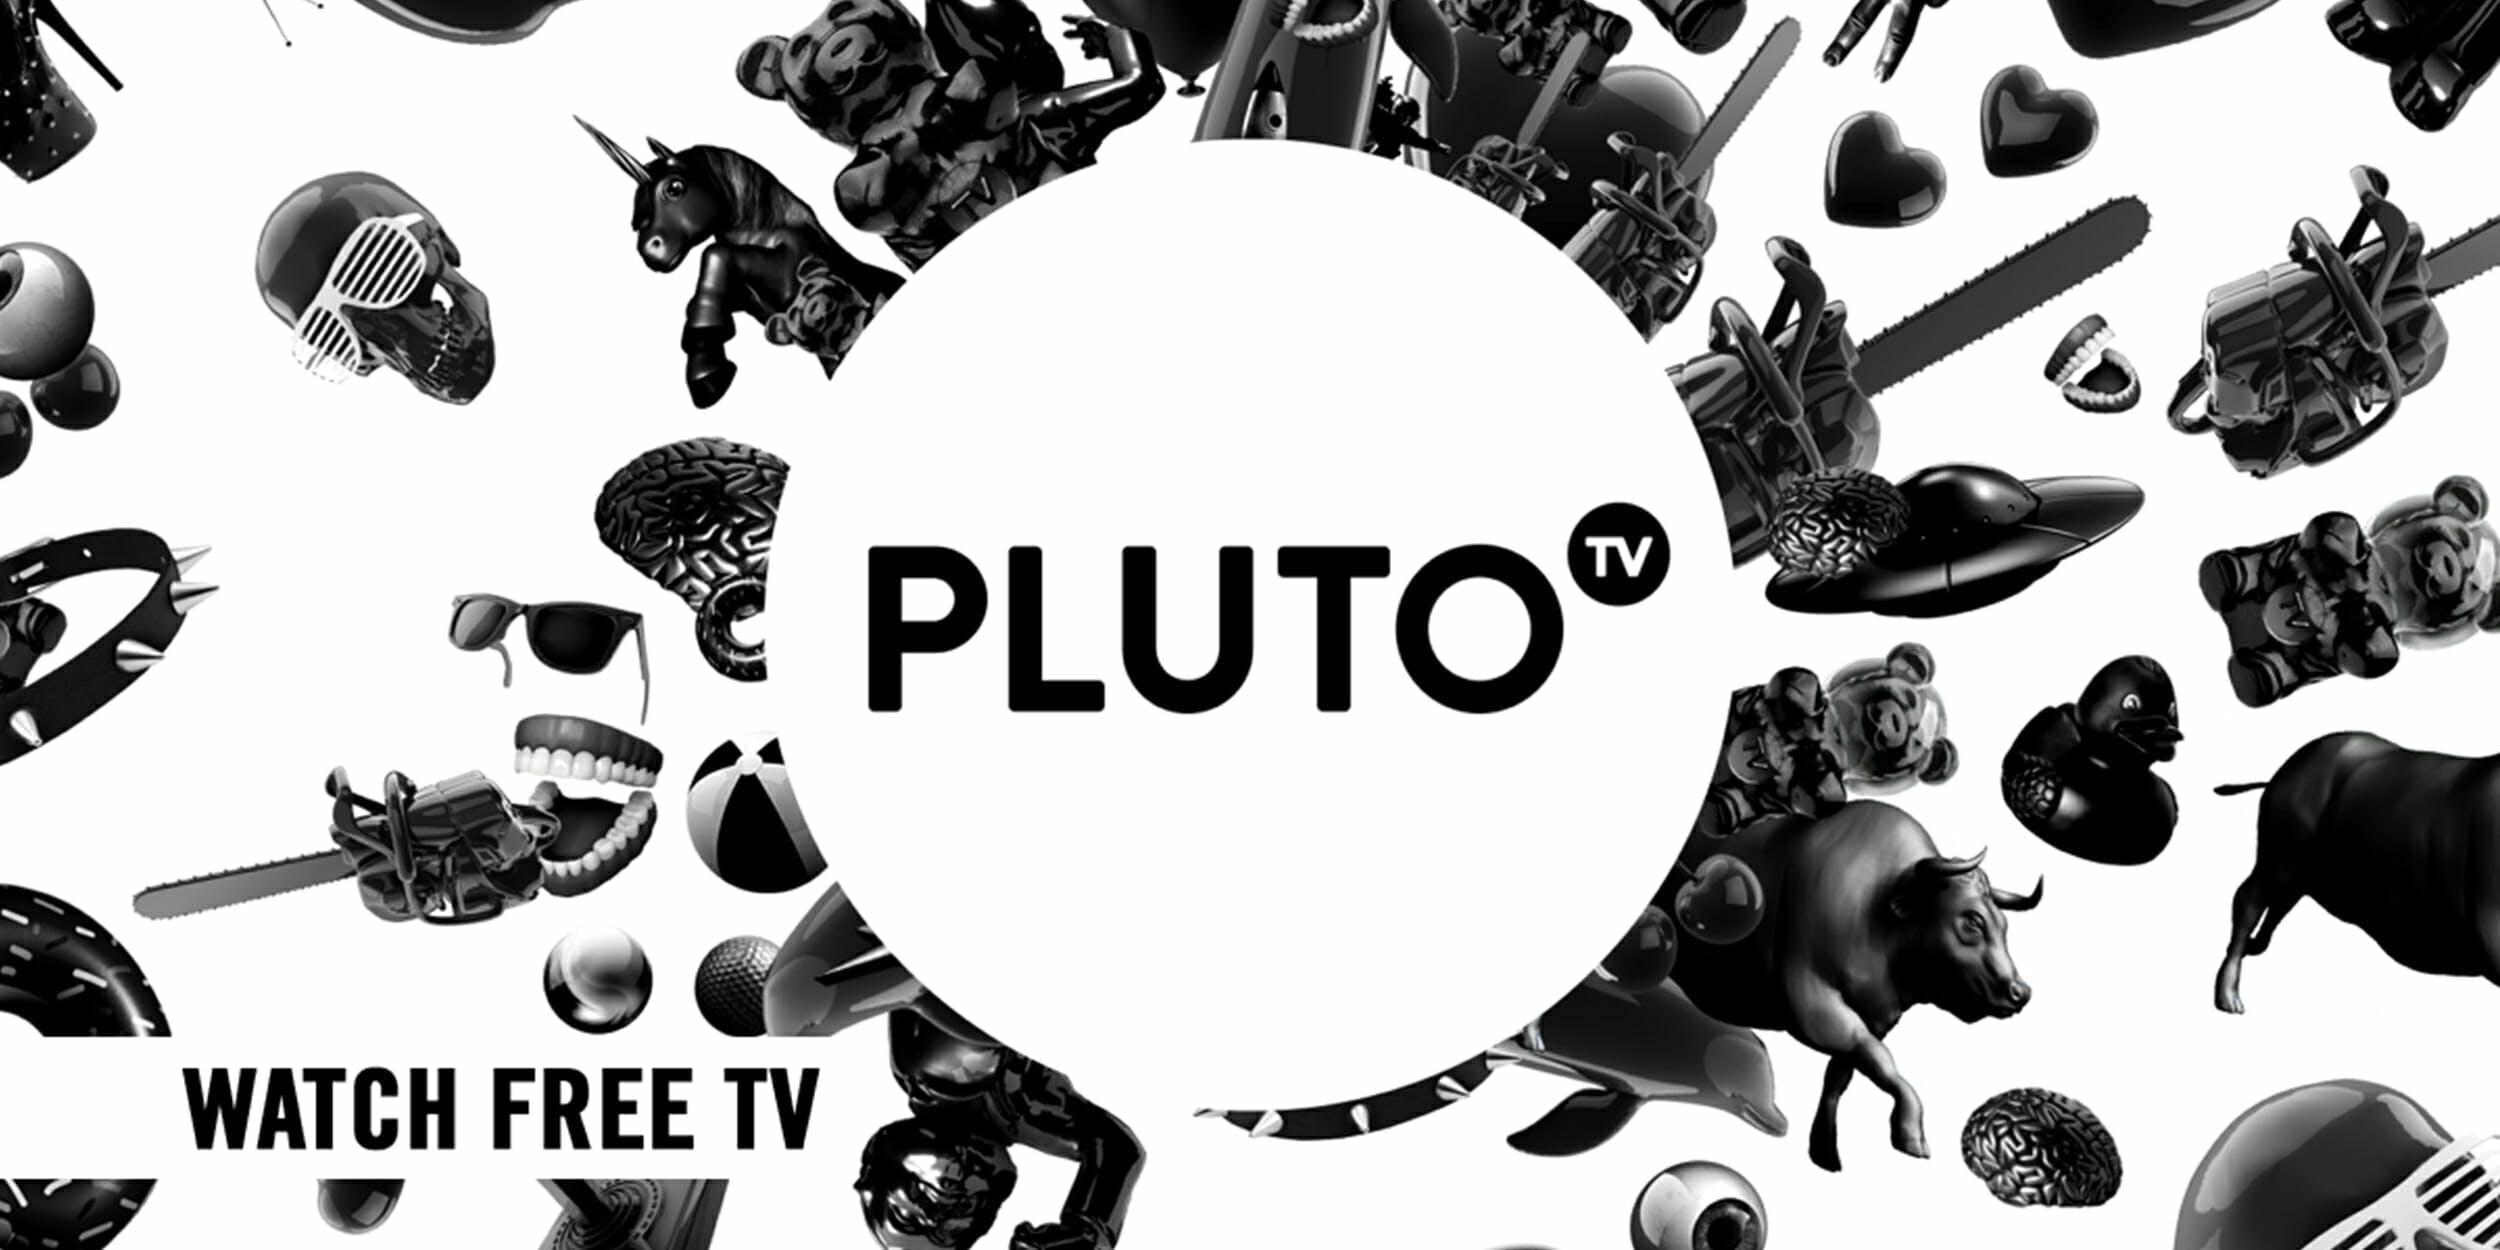 free live tv - pluto tv